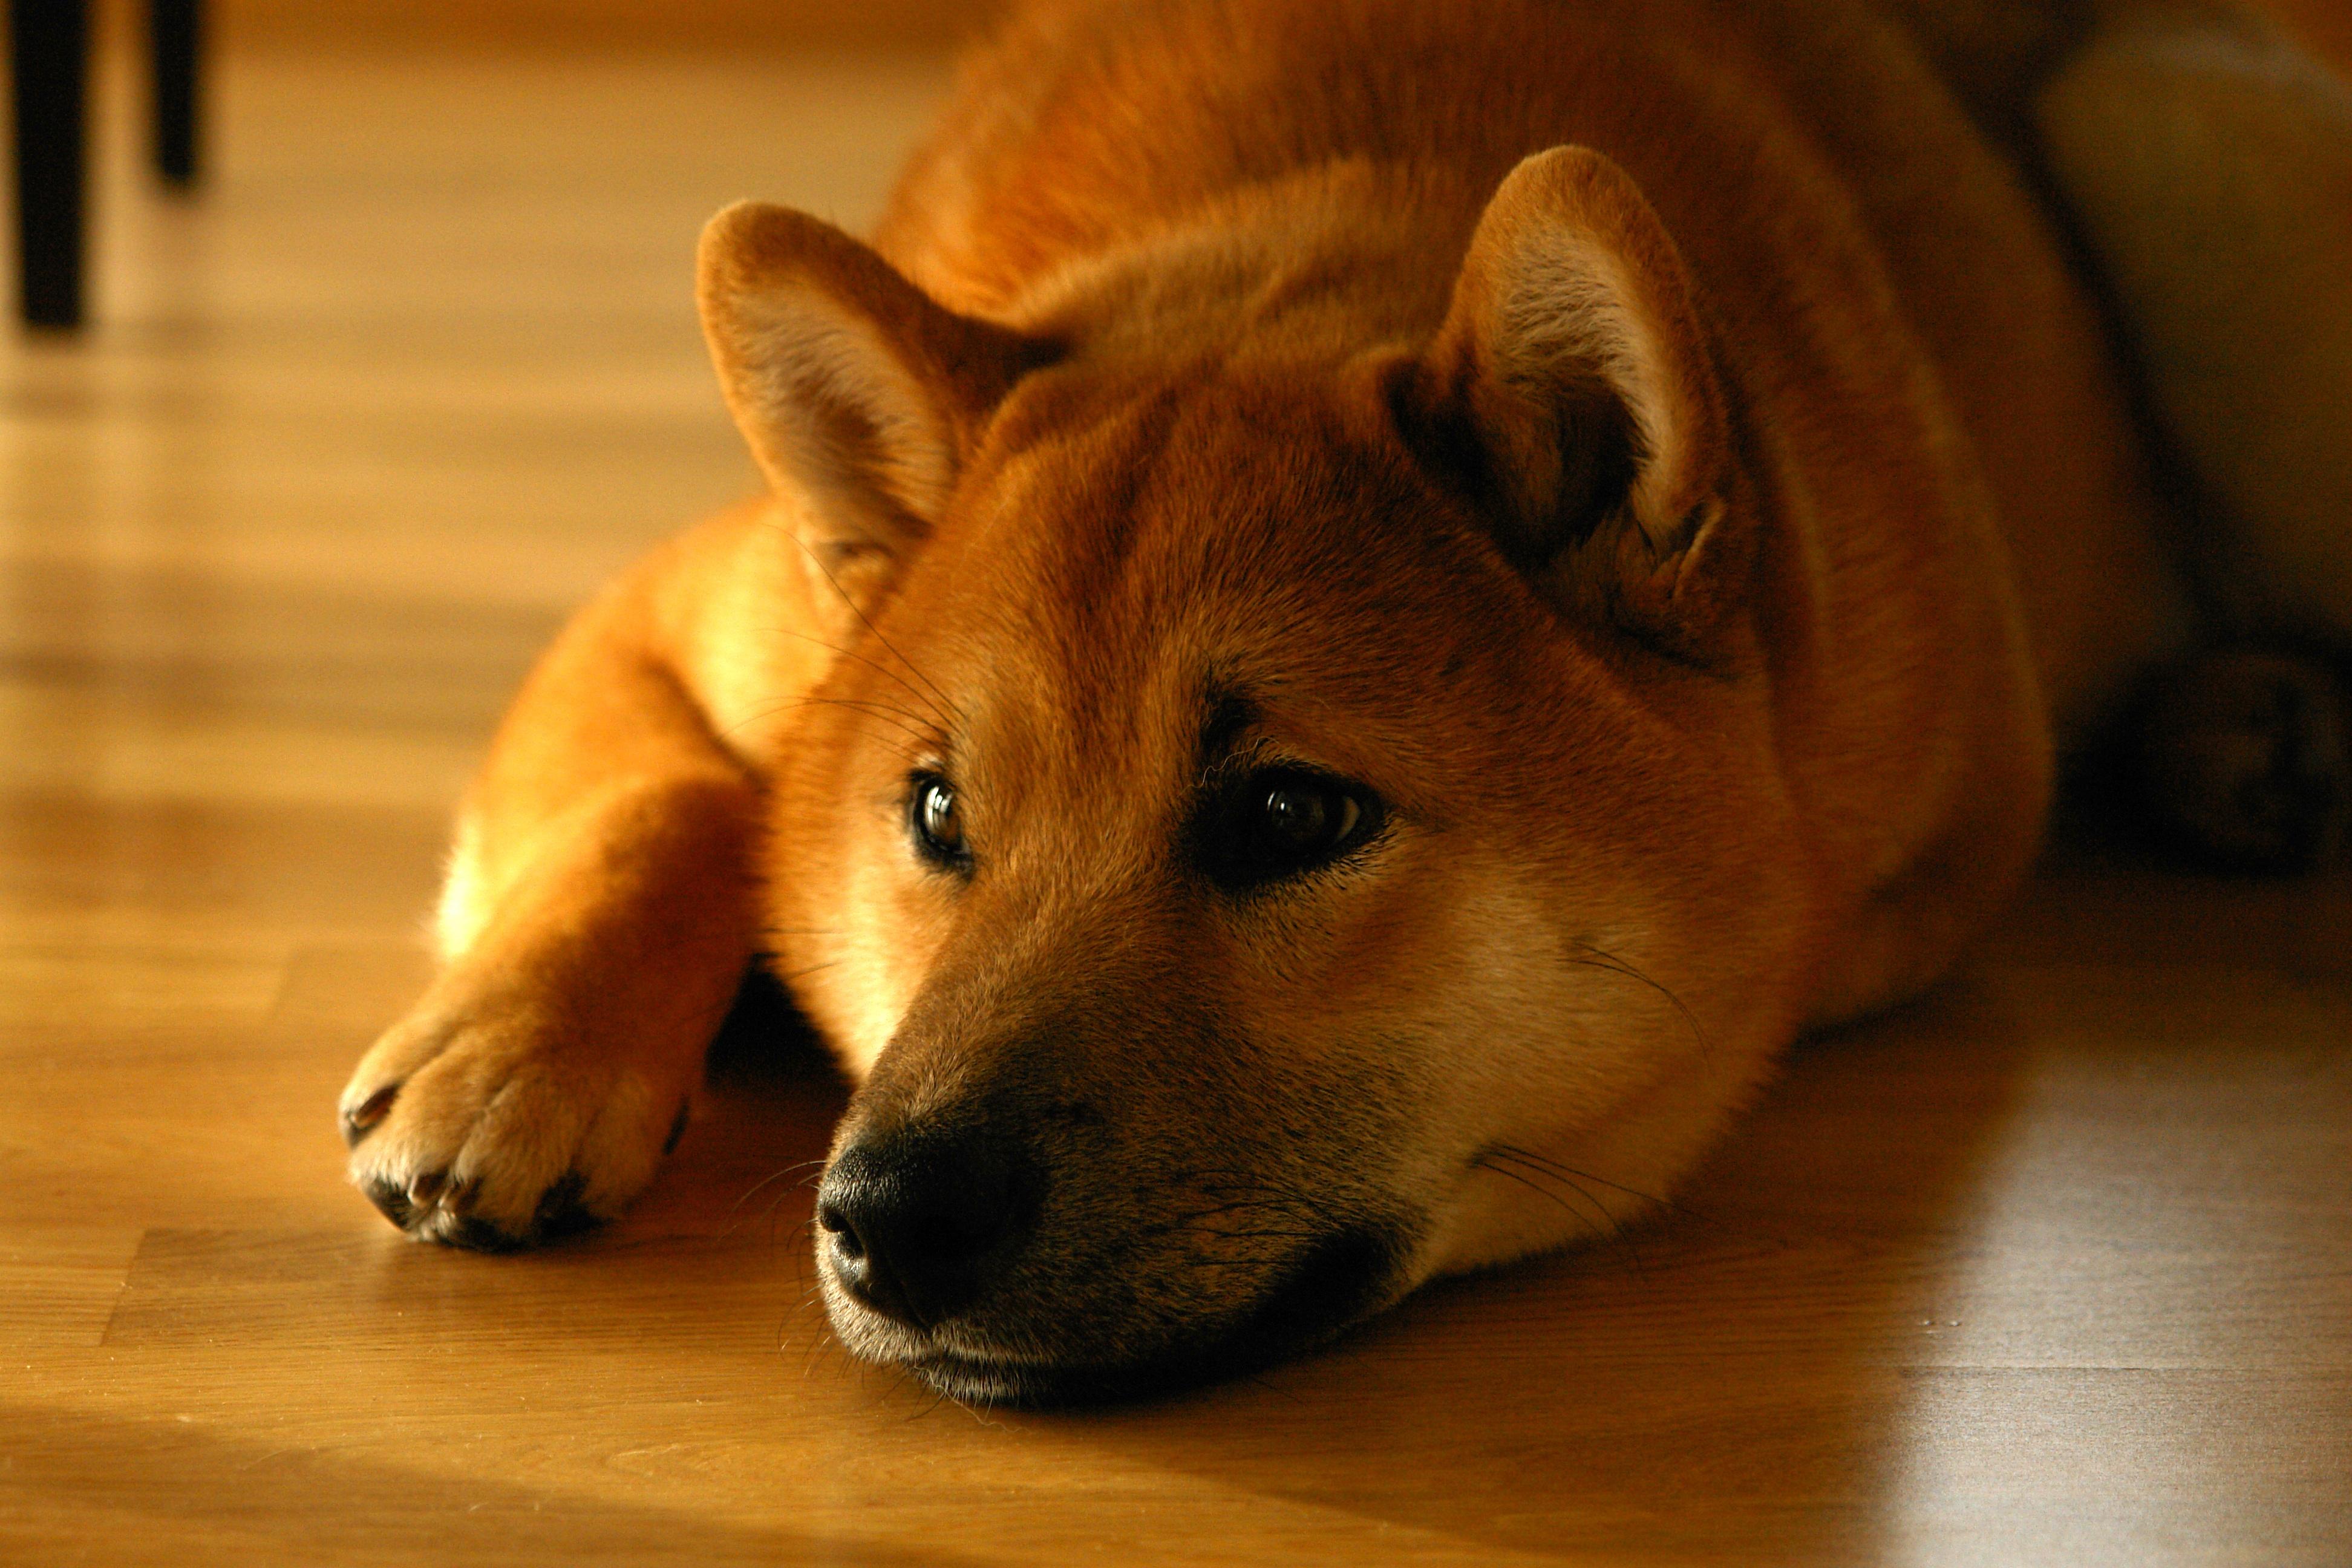 Download mobile wallpaper Siba Inu, Muzzle, Shiba Inu, Lies, Animals, Dog for free.